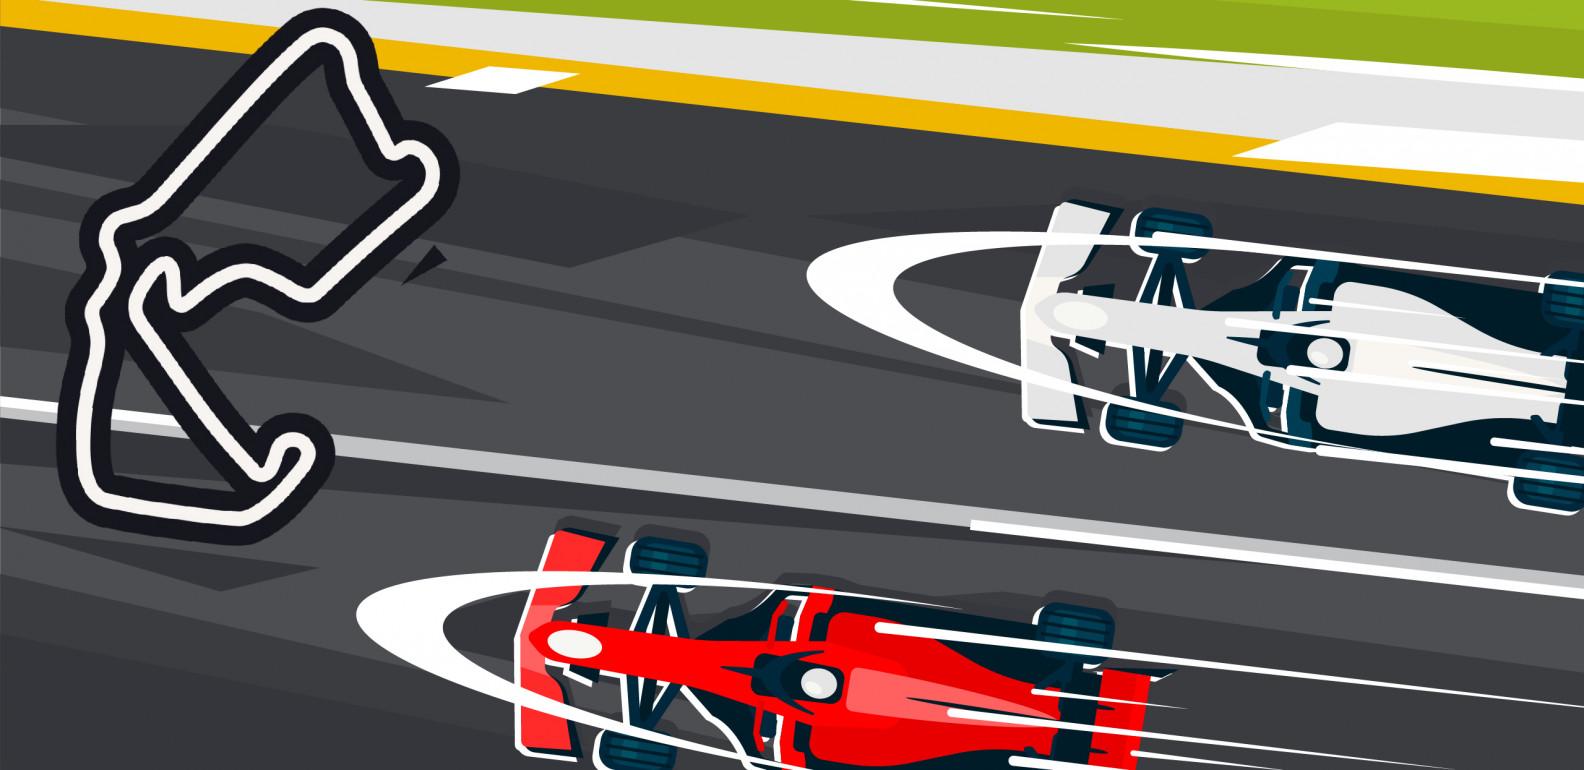 Hoe kun je de Grand Prix van Silverstone gratis live streamen?